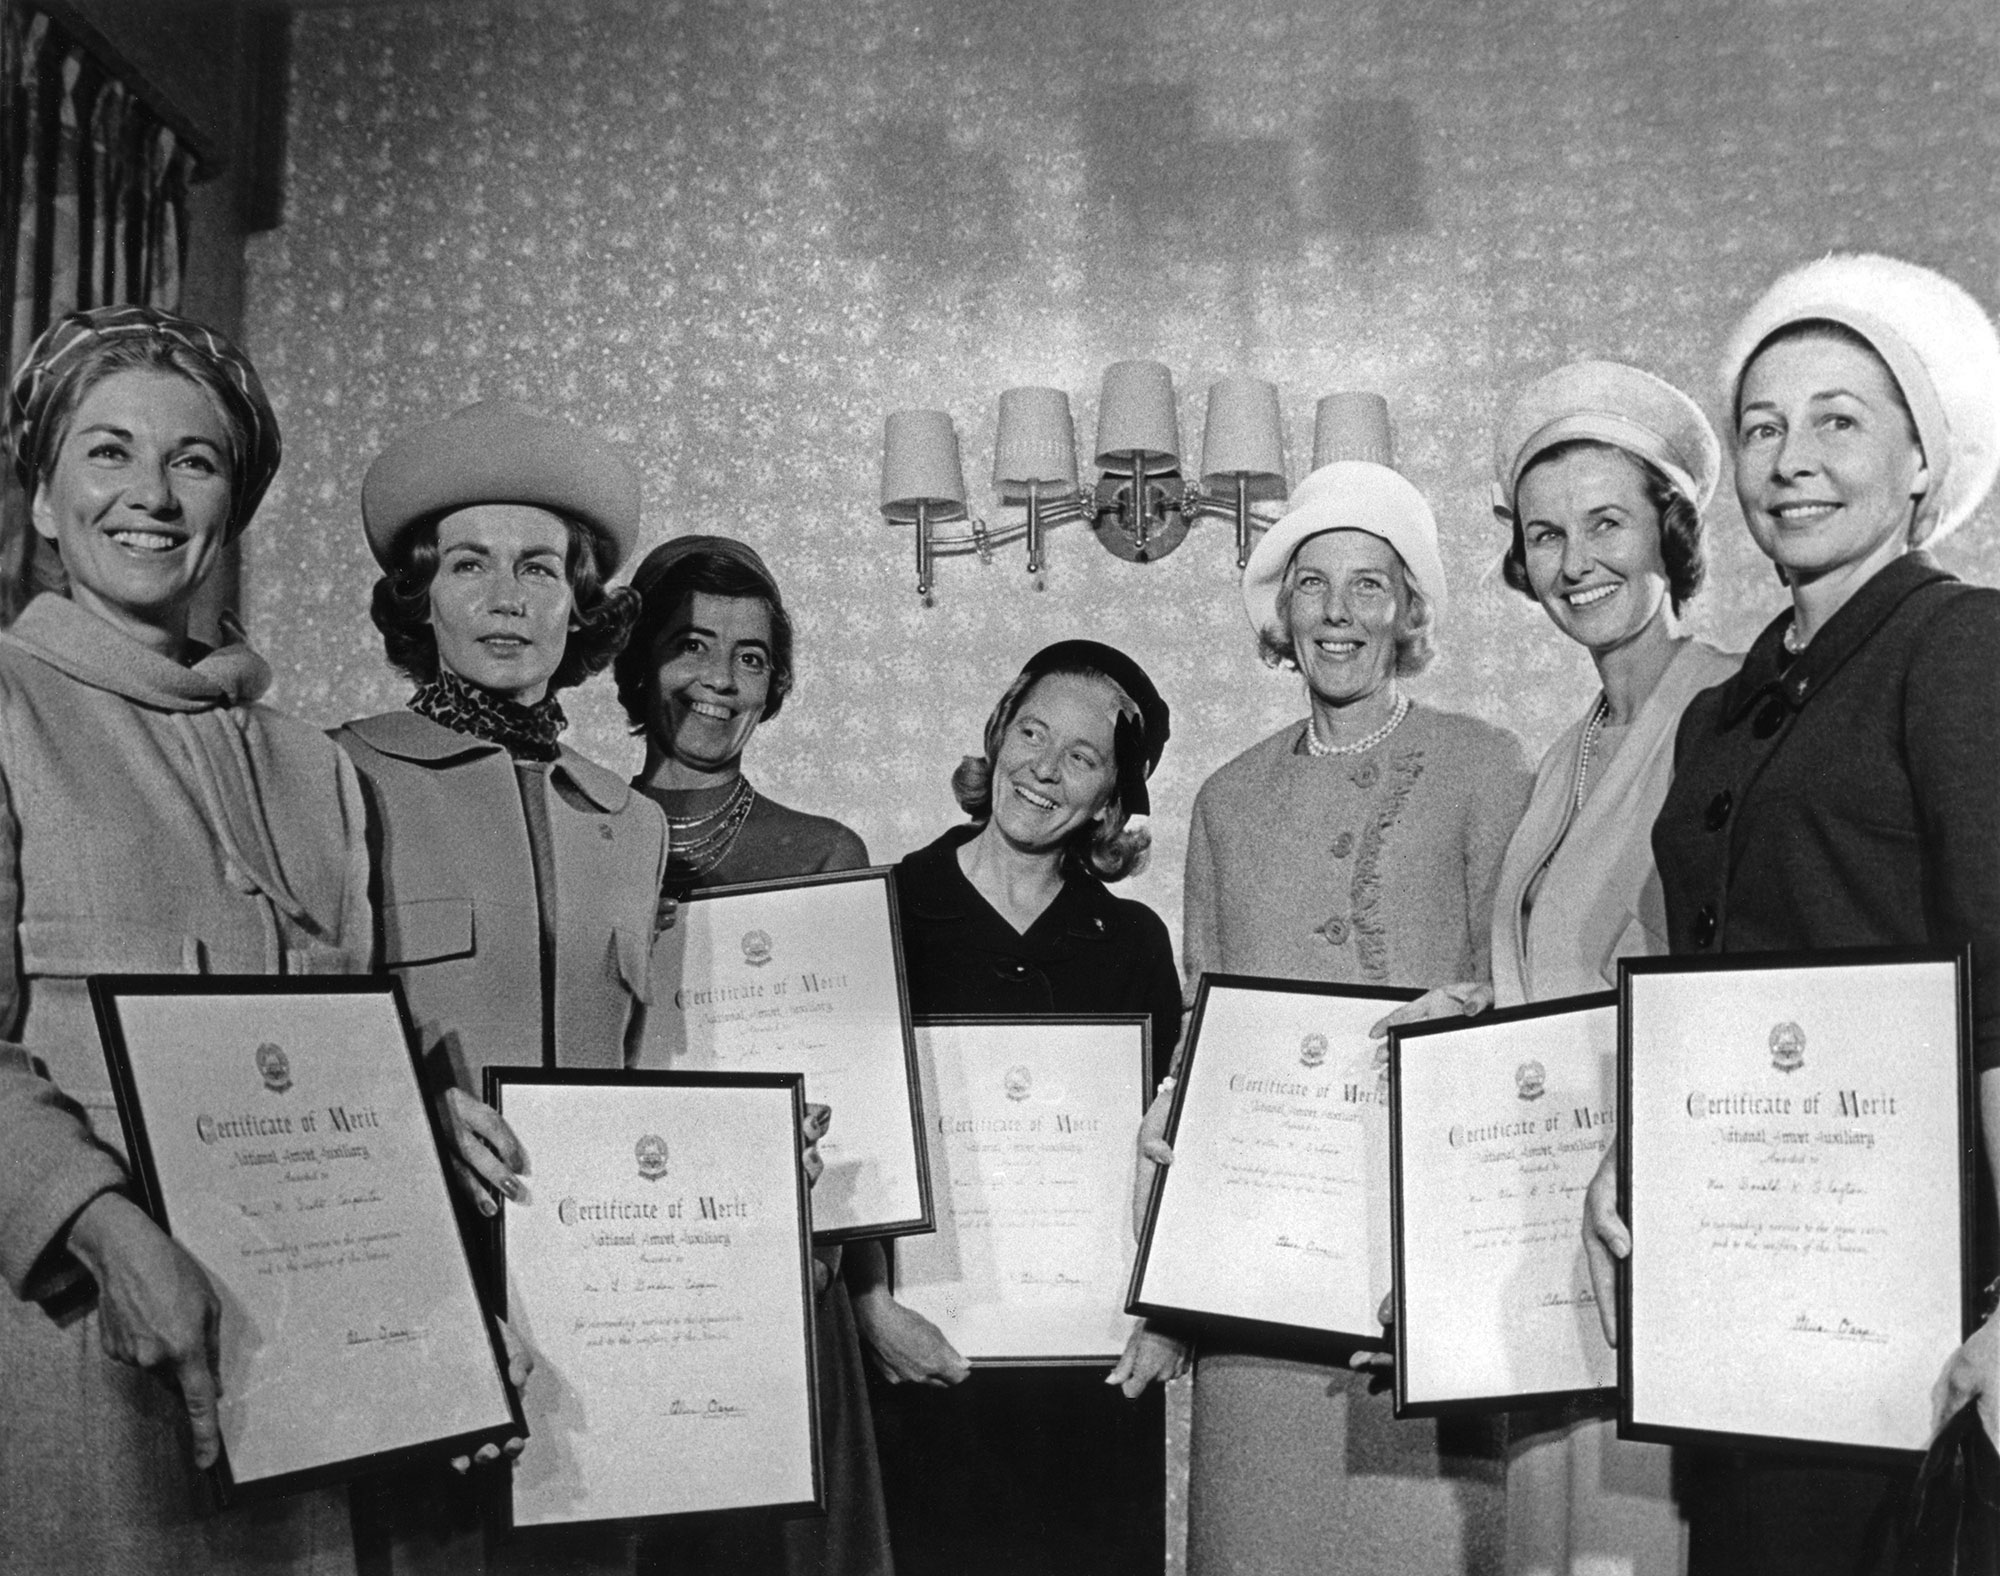 Meet the REAL Astronaut Wives Club - RocketSTEM